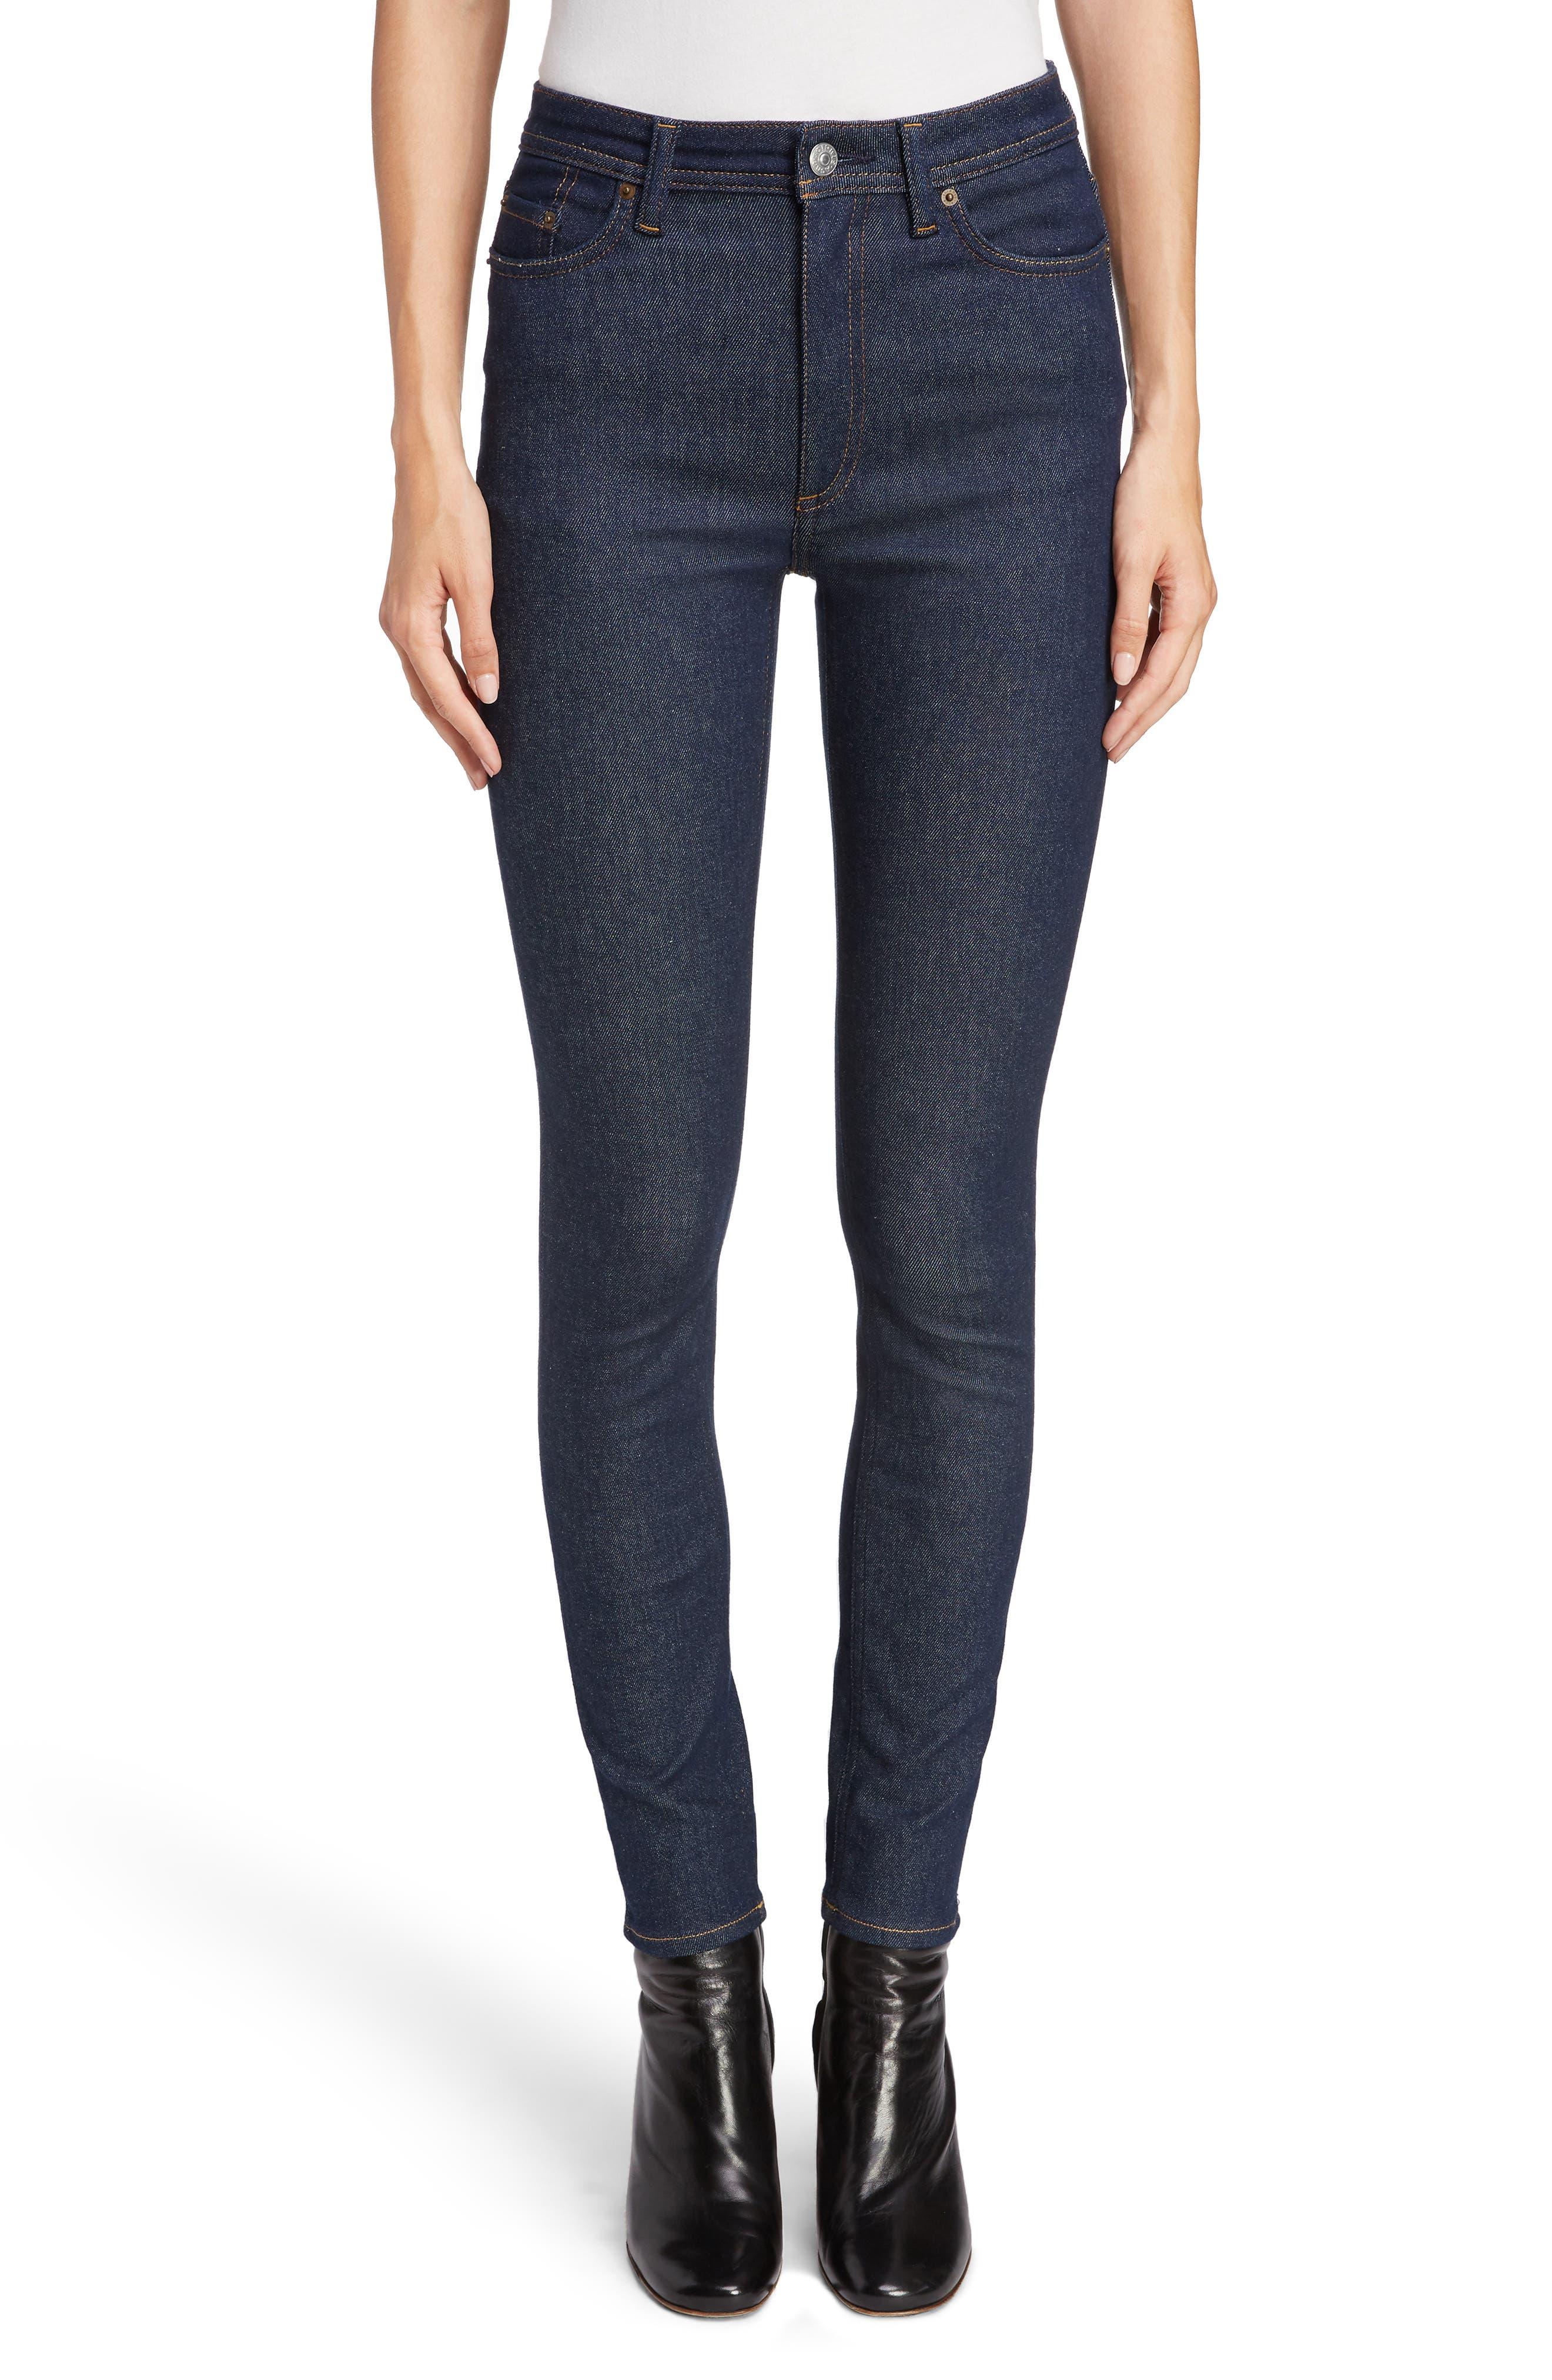 Peg High Waist Skinny Jeans in Indigo